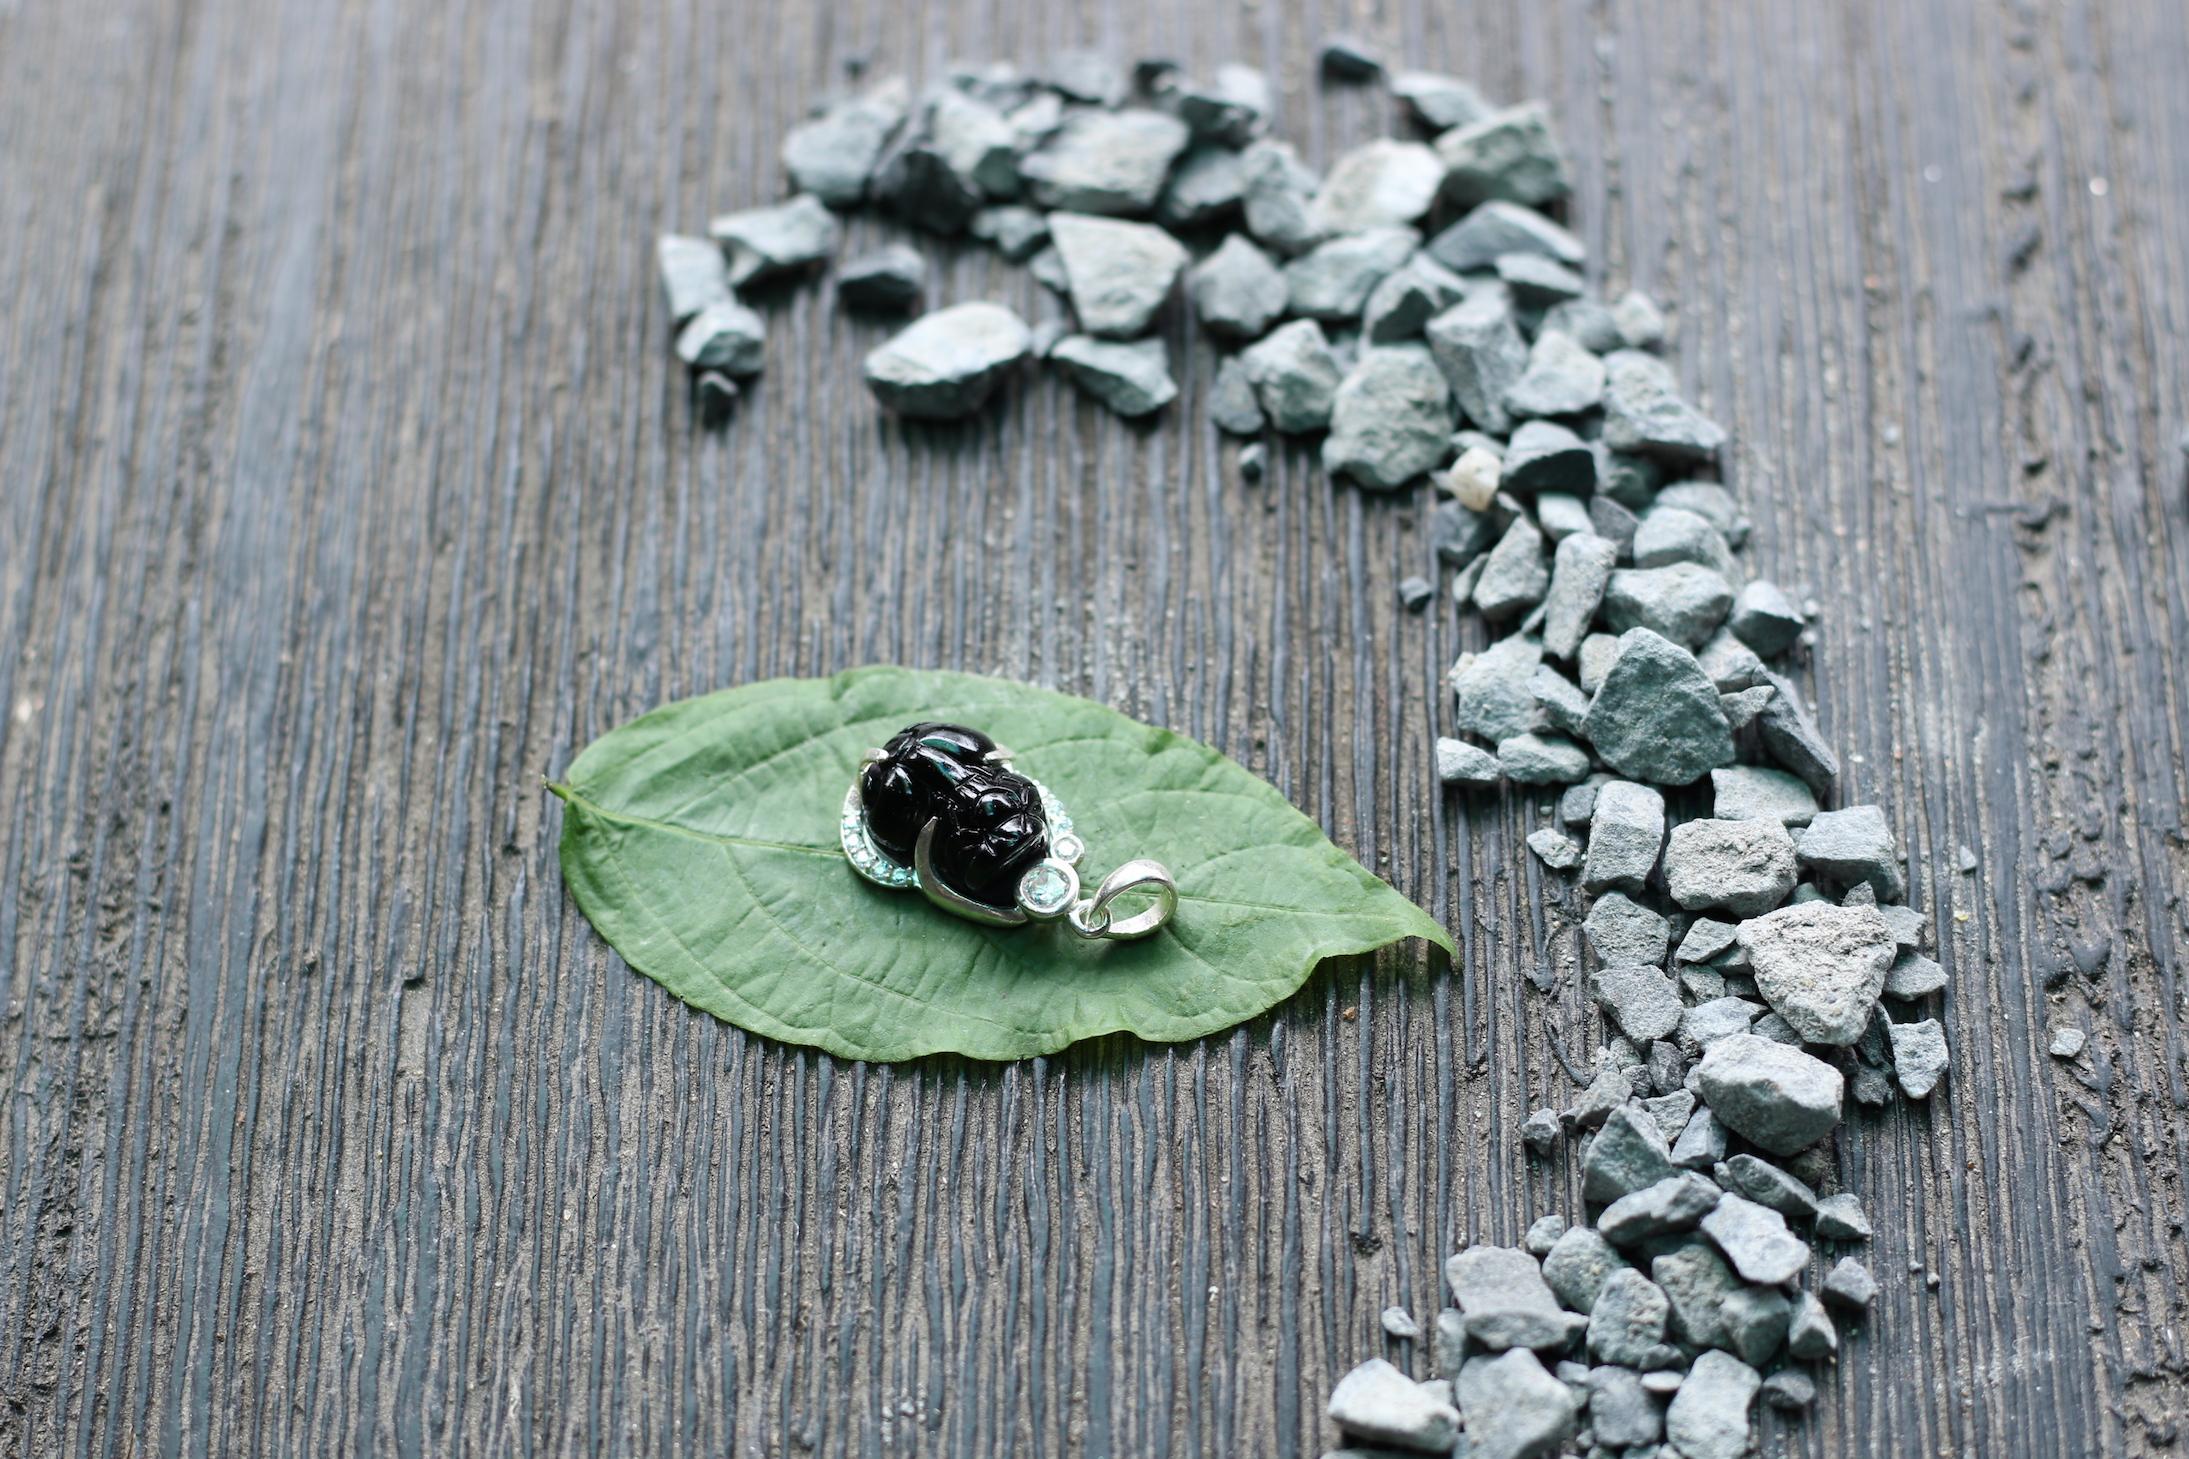 Tỳ hưu pha lê bọc bạc - đen 2.JPG